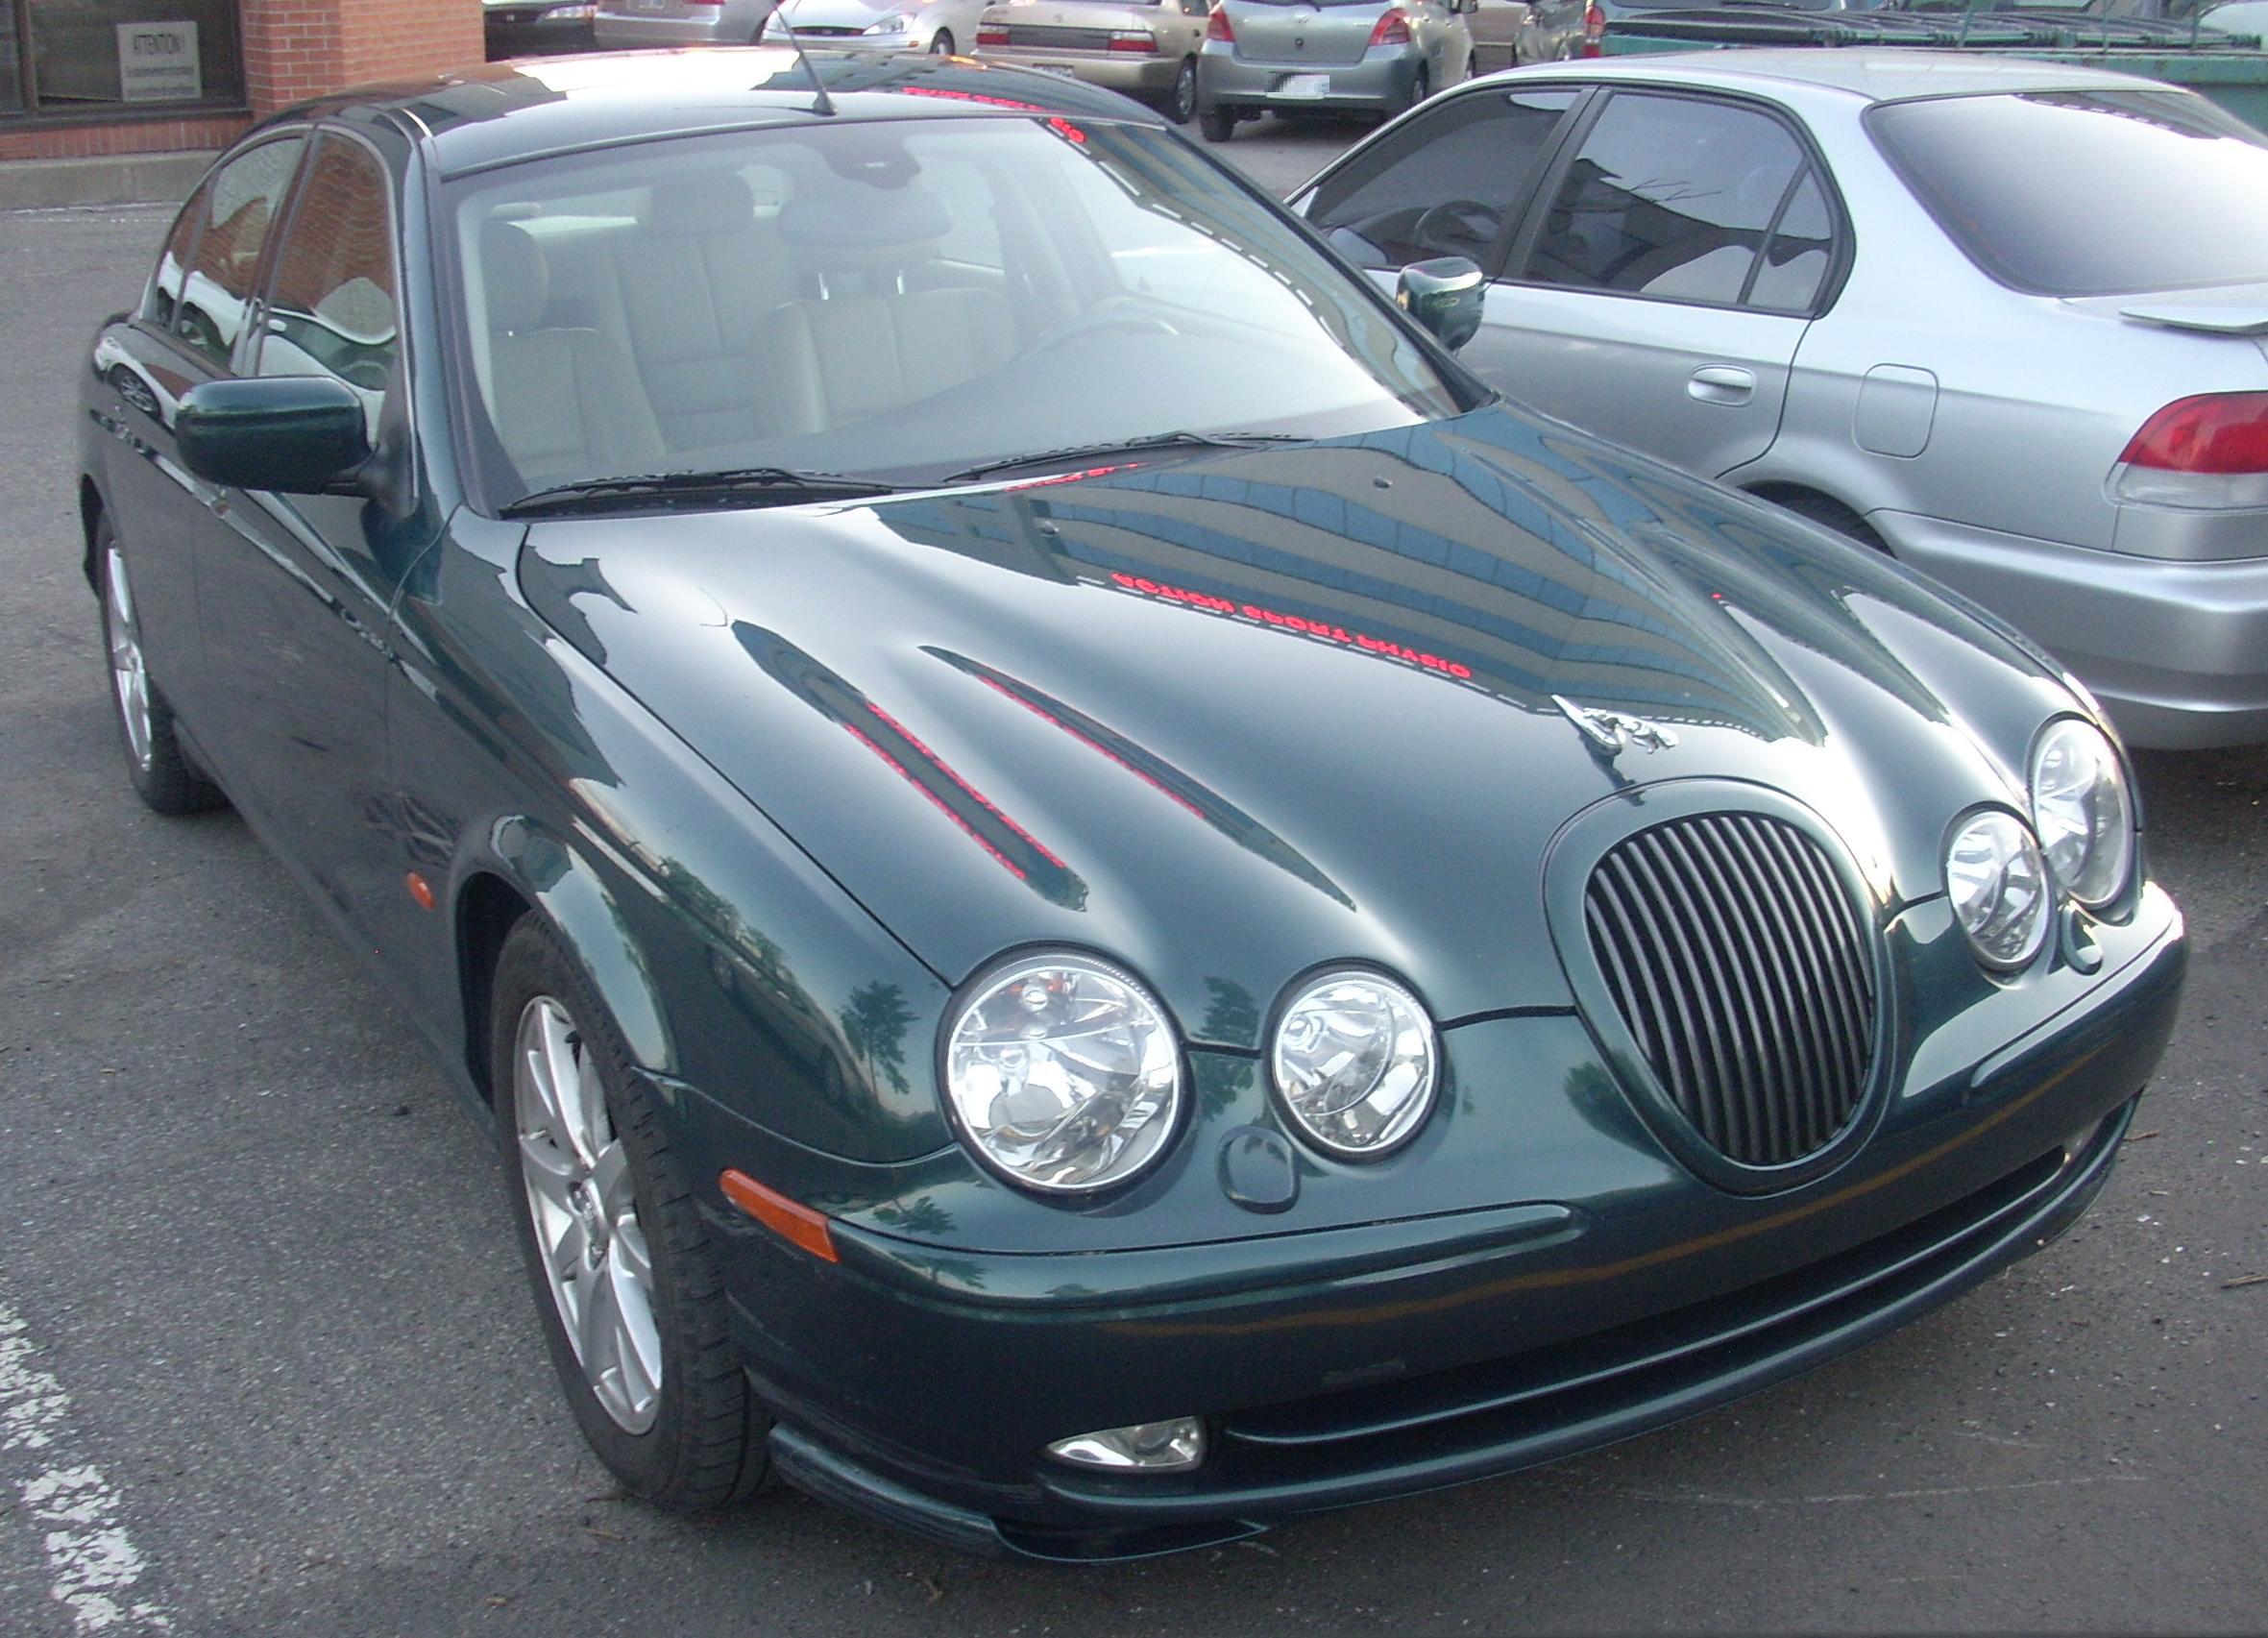 00 jaguar s type